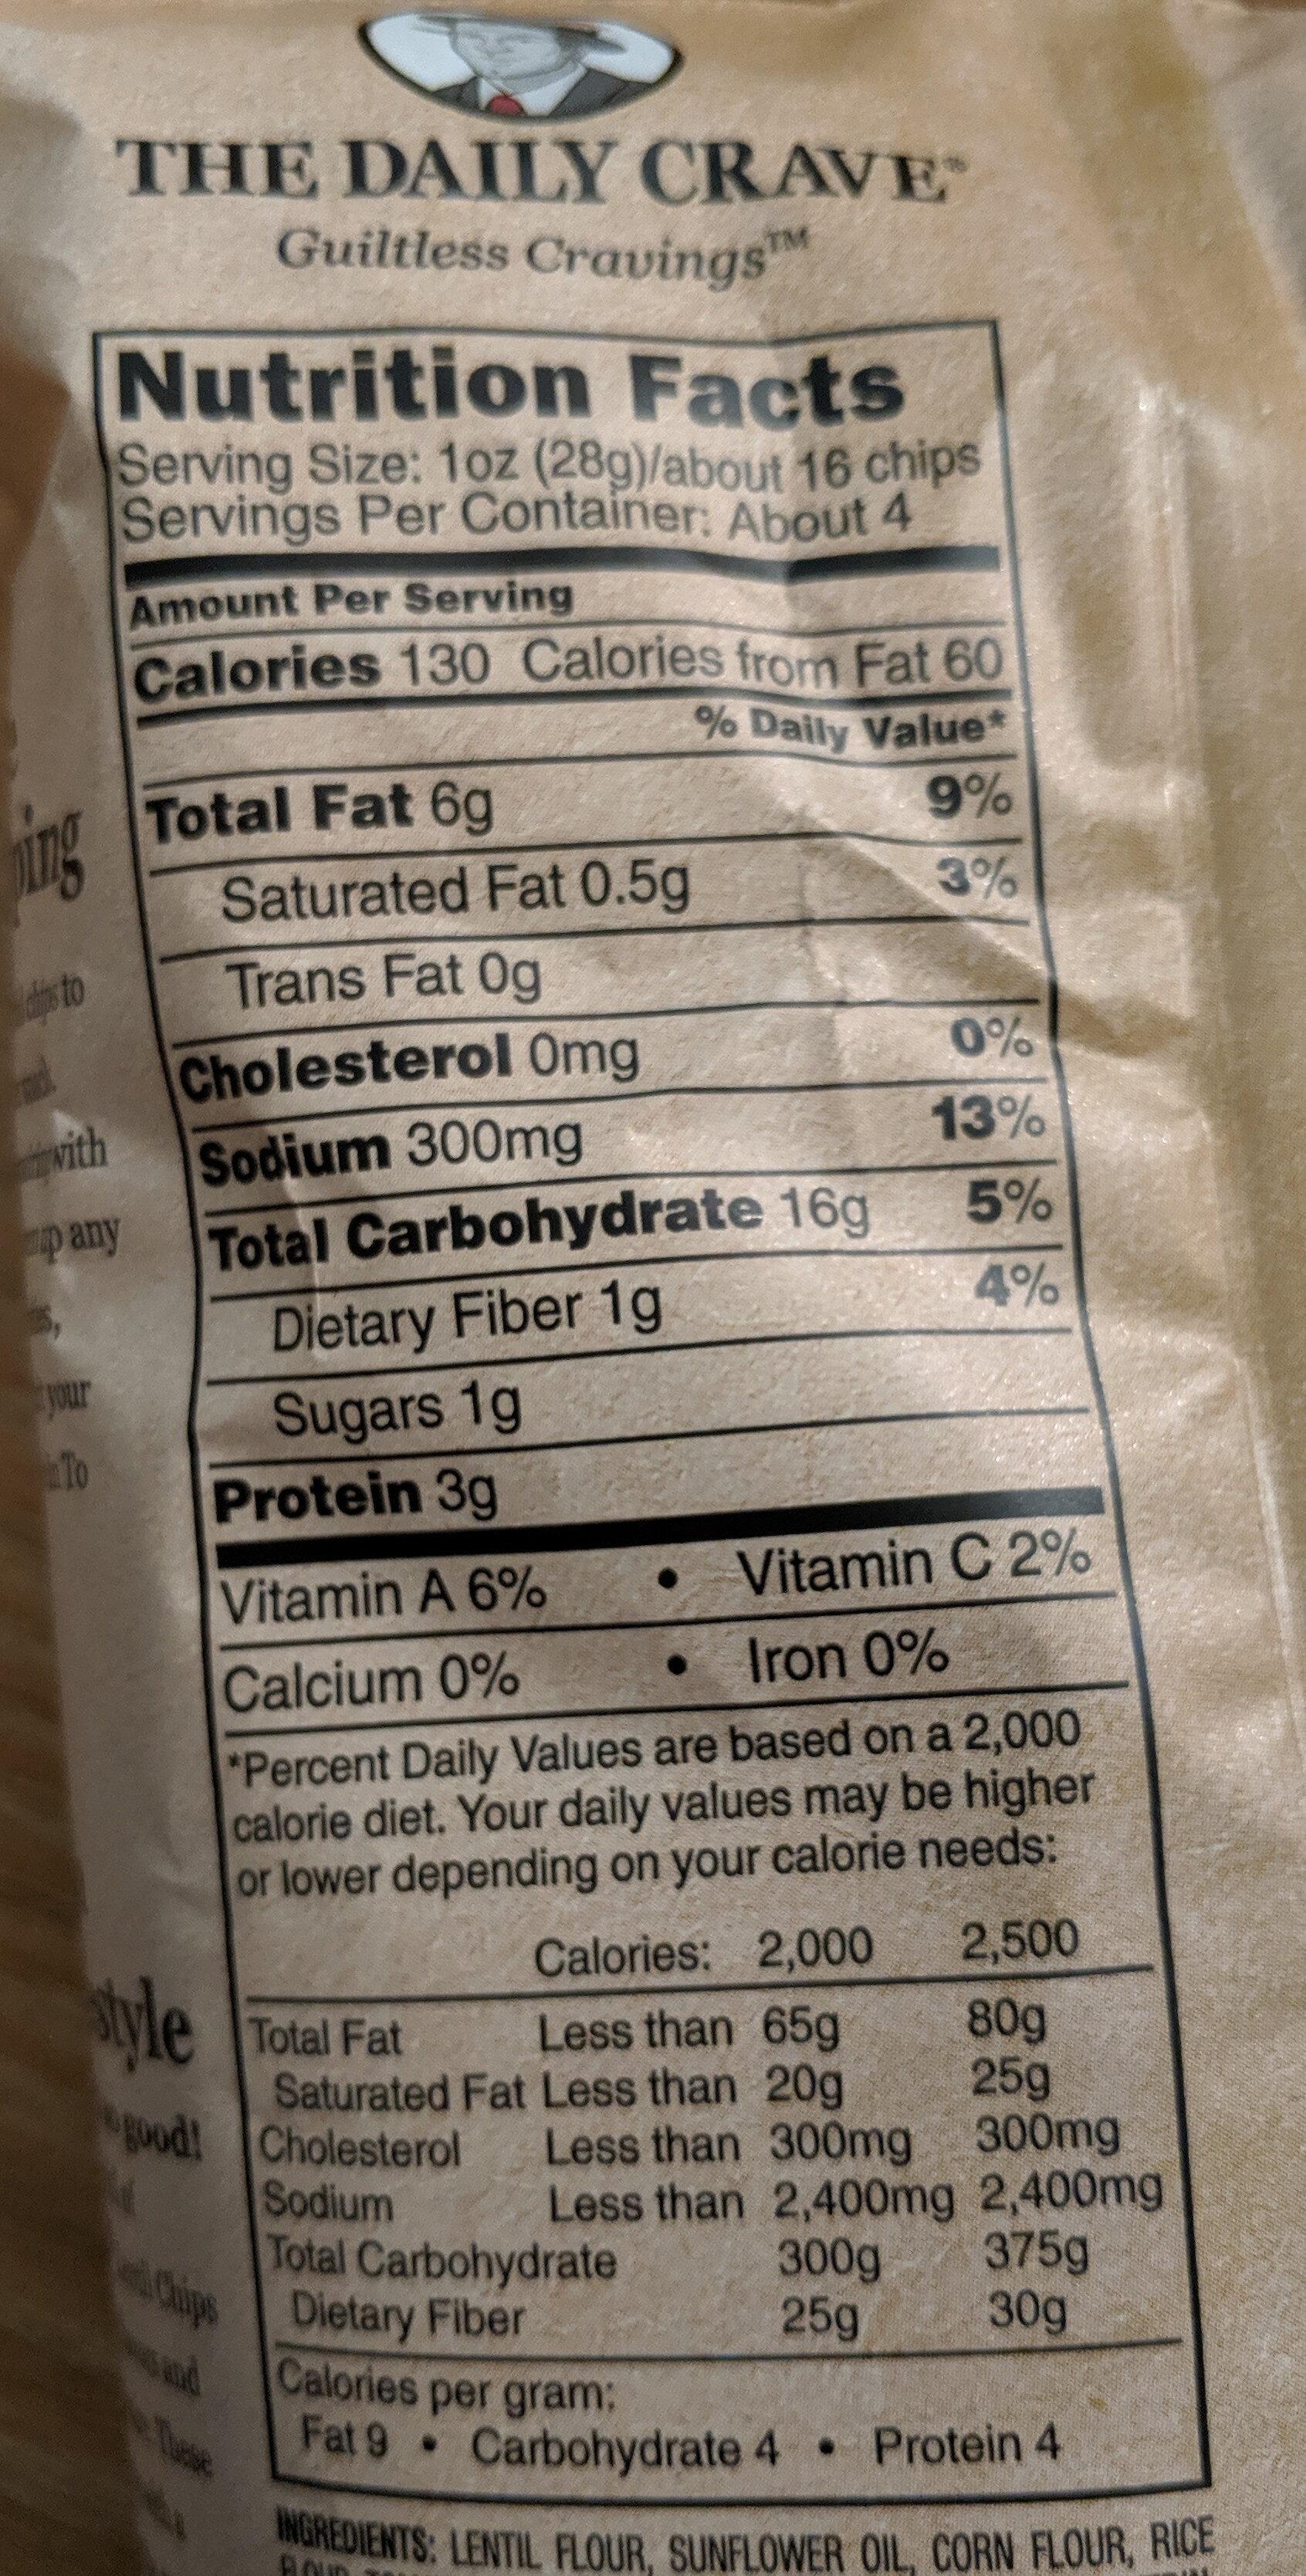 Tomato basil flavored lentil chips, tomato basil - Nutrition facts - en